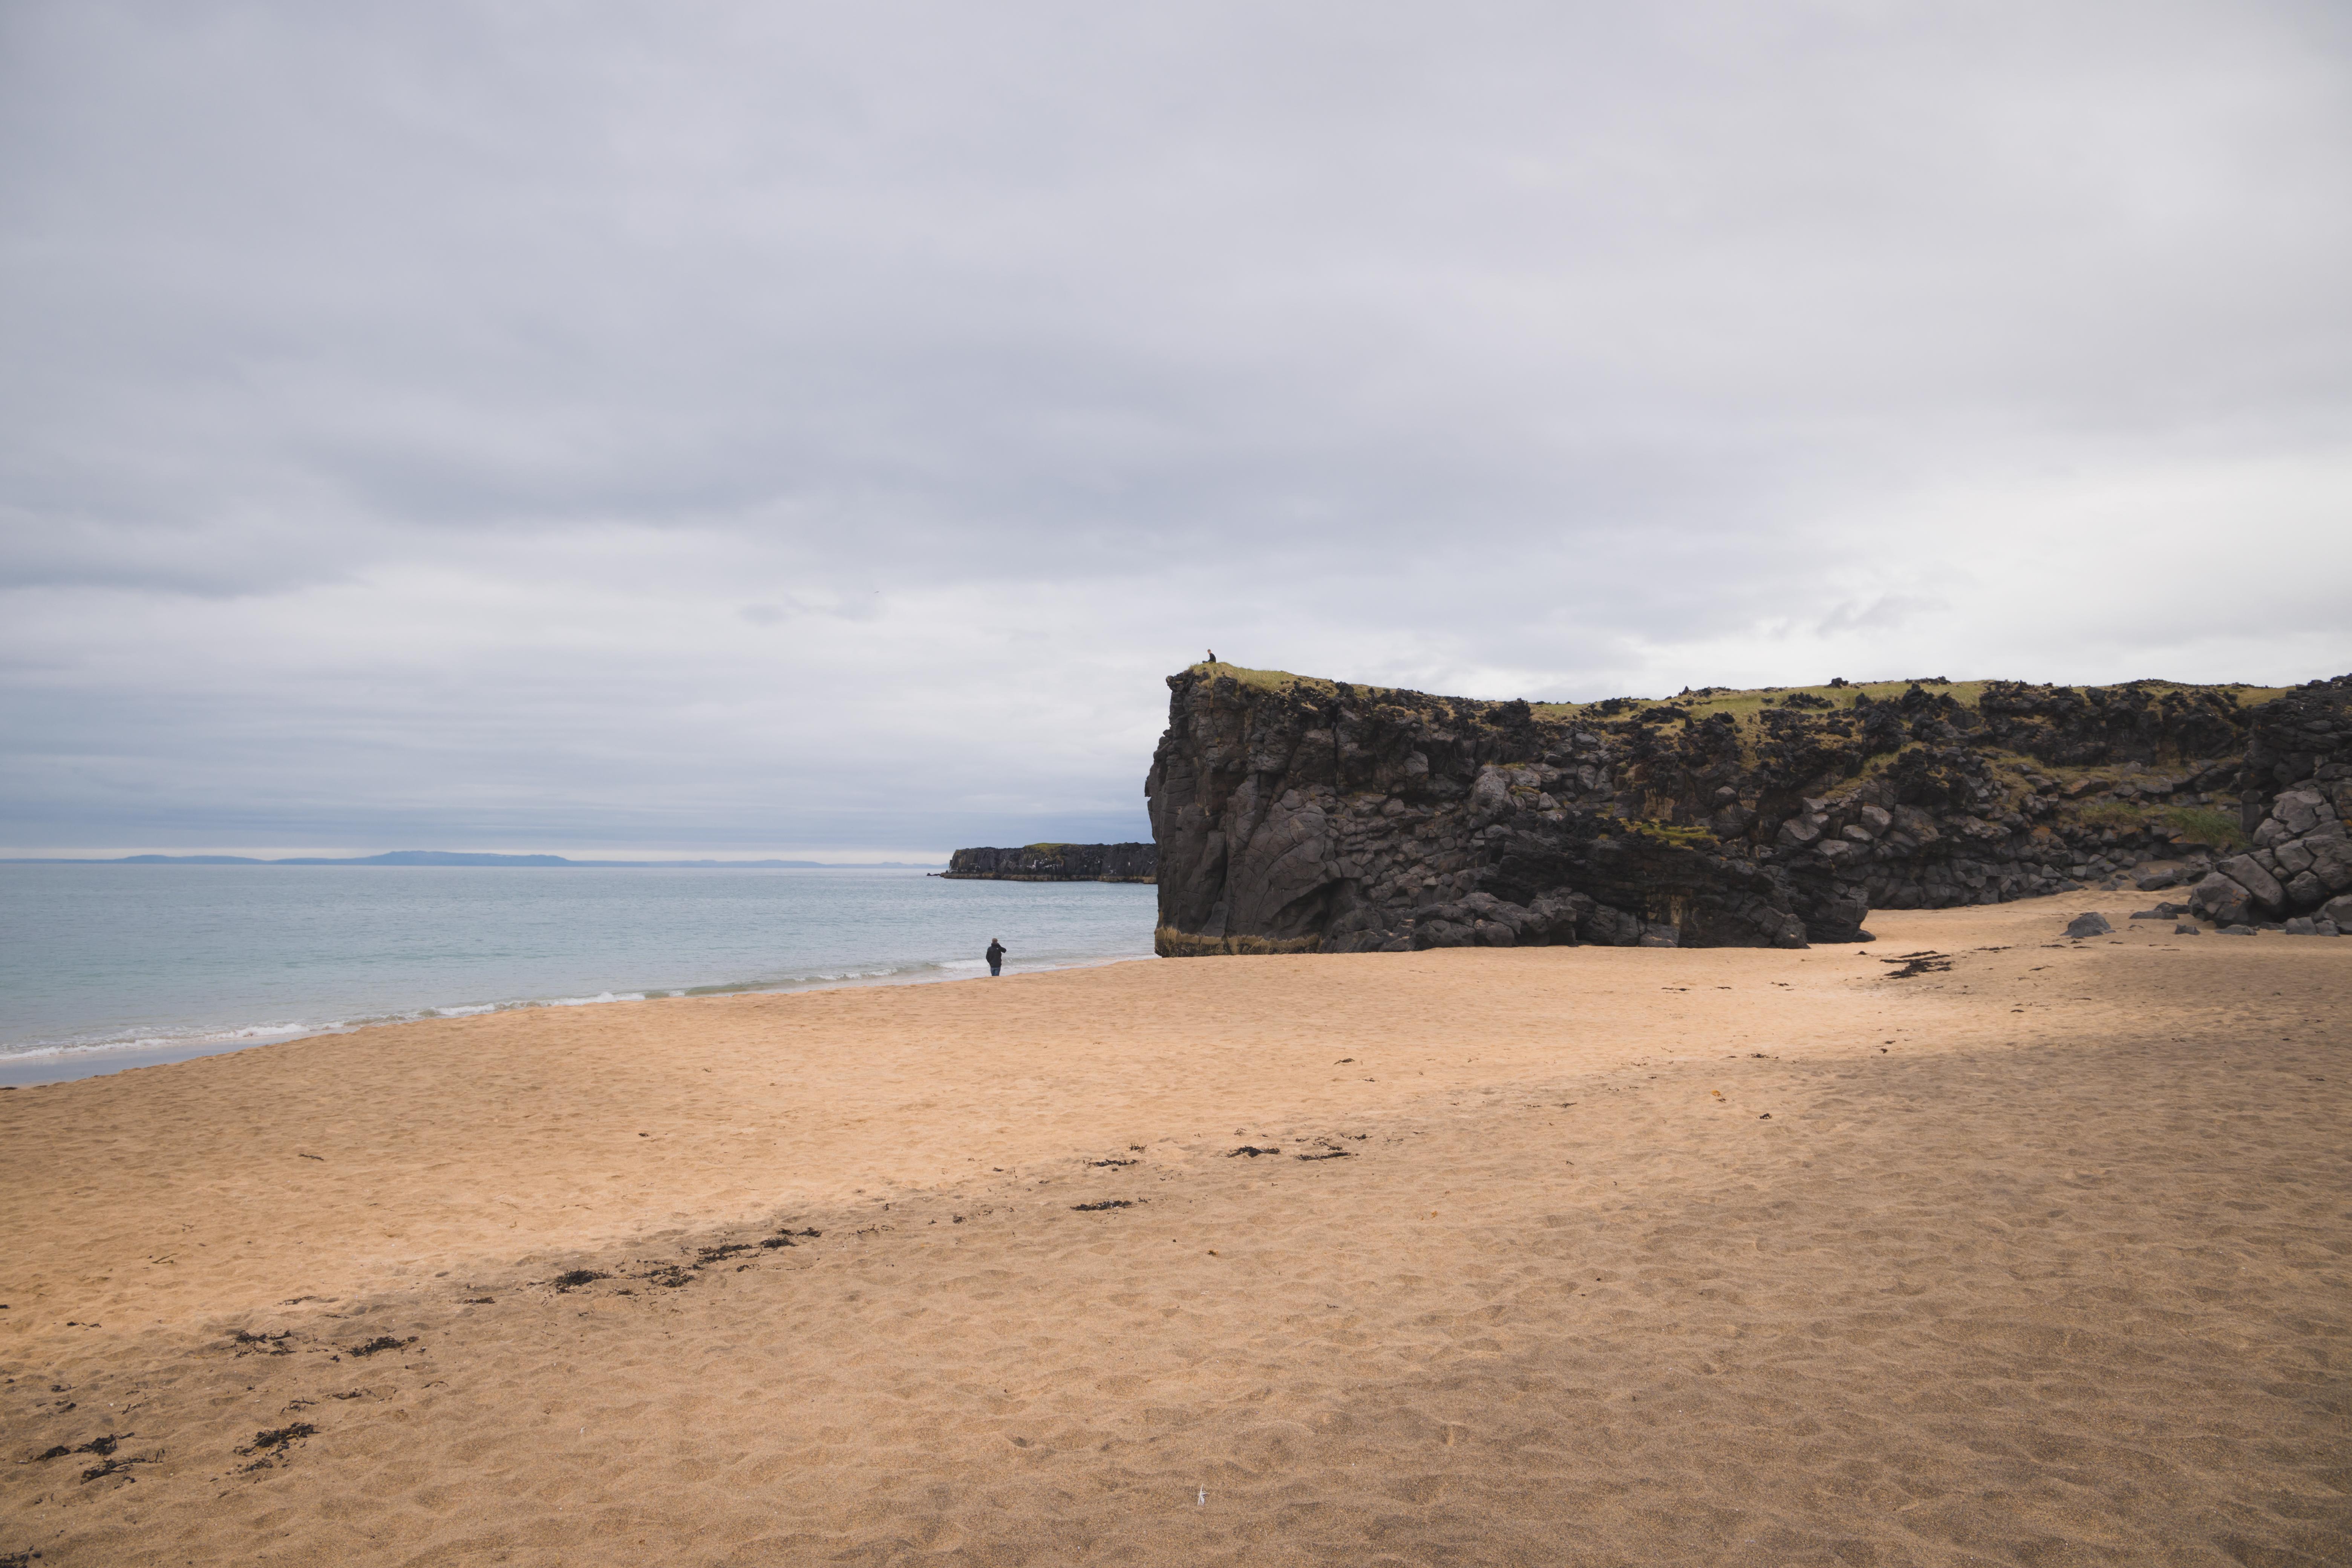 Islande | La péninsule du Snæfellsness - Skarðsvík